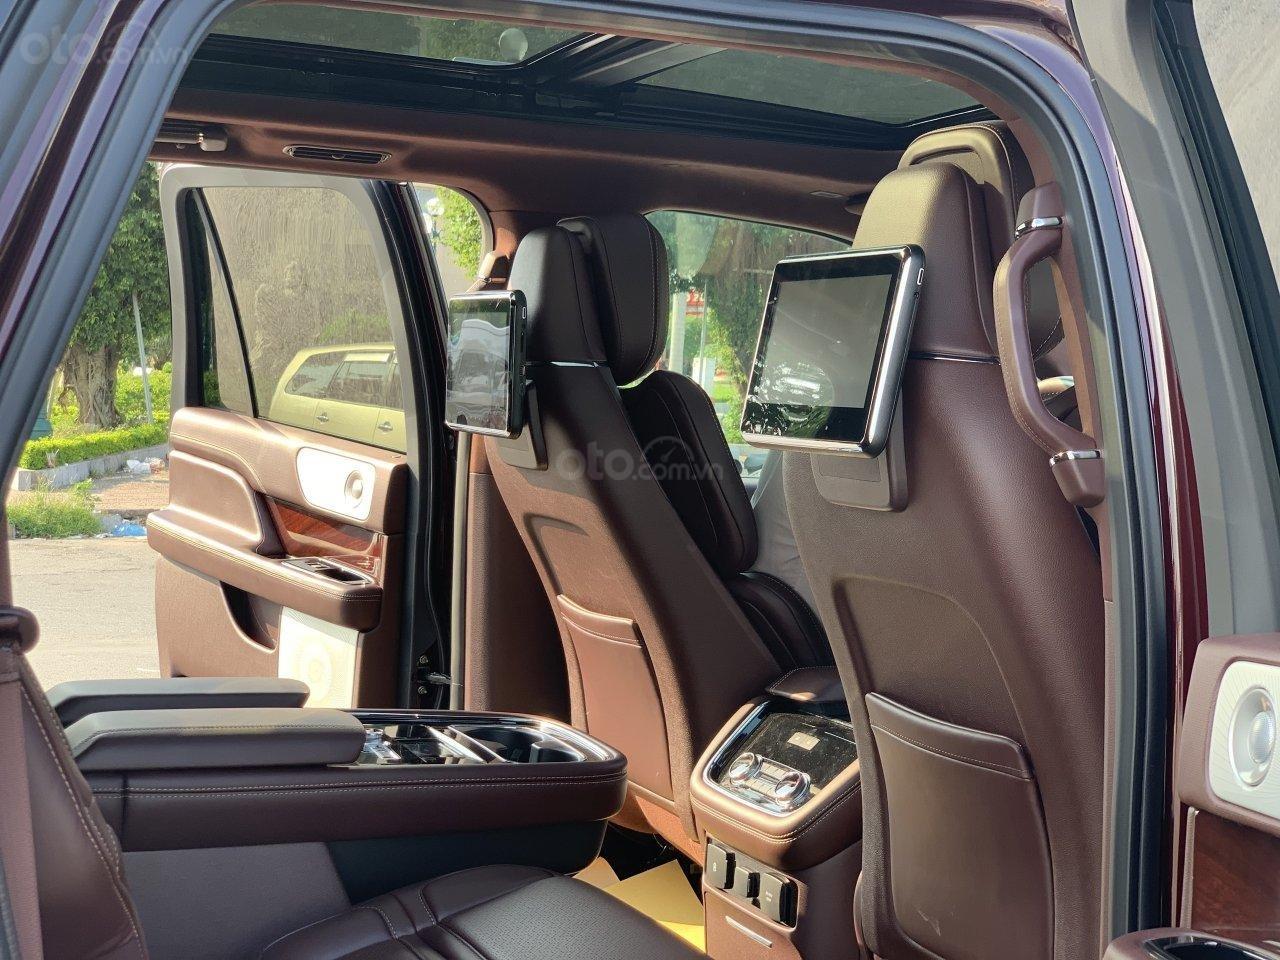 Giao ngay Lincoln Navigator Black Label sản xuất 2019, mới 100%, giá tốt (6)